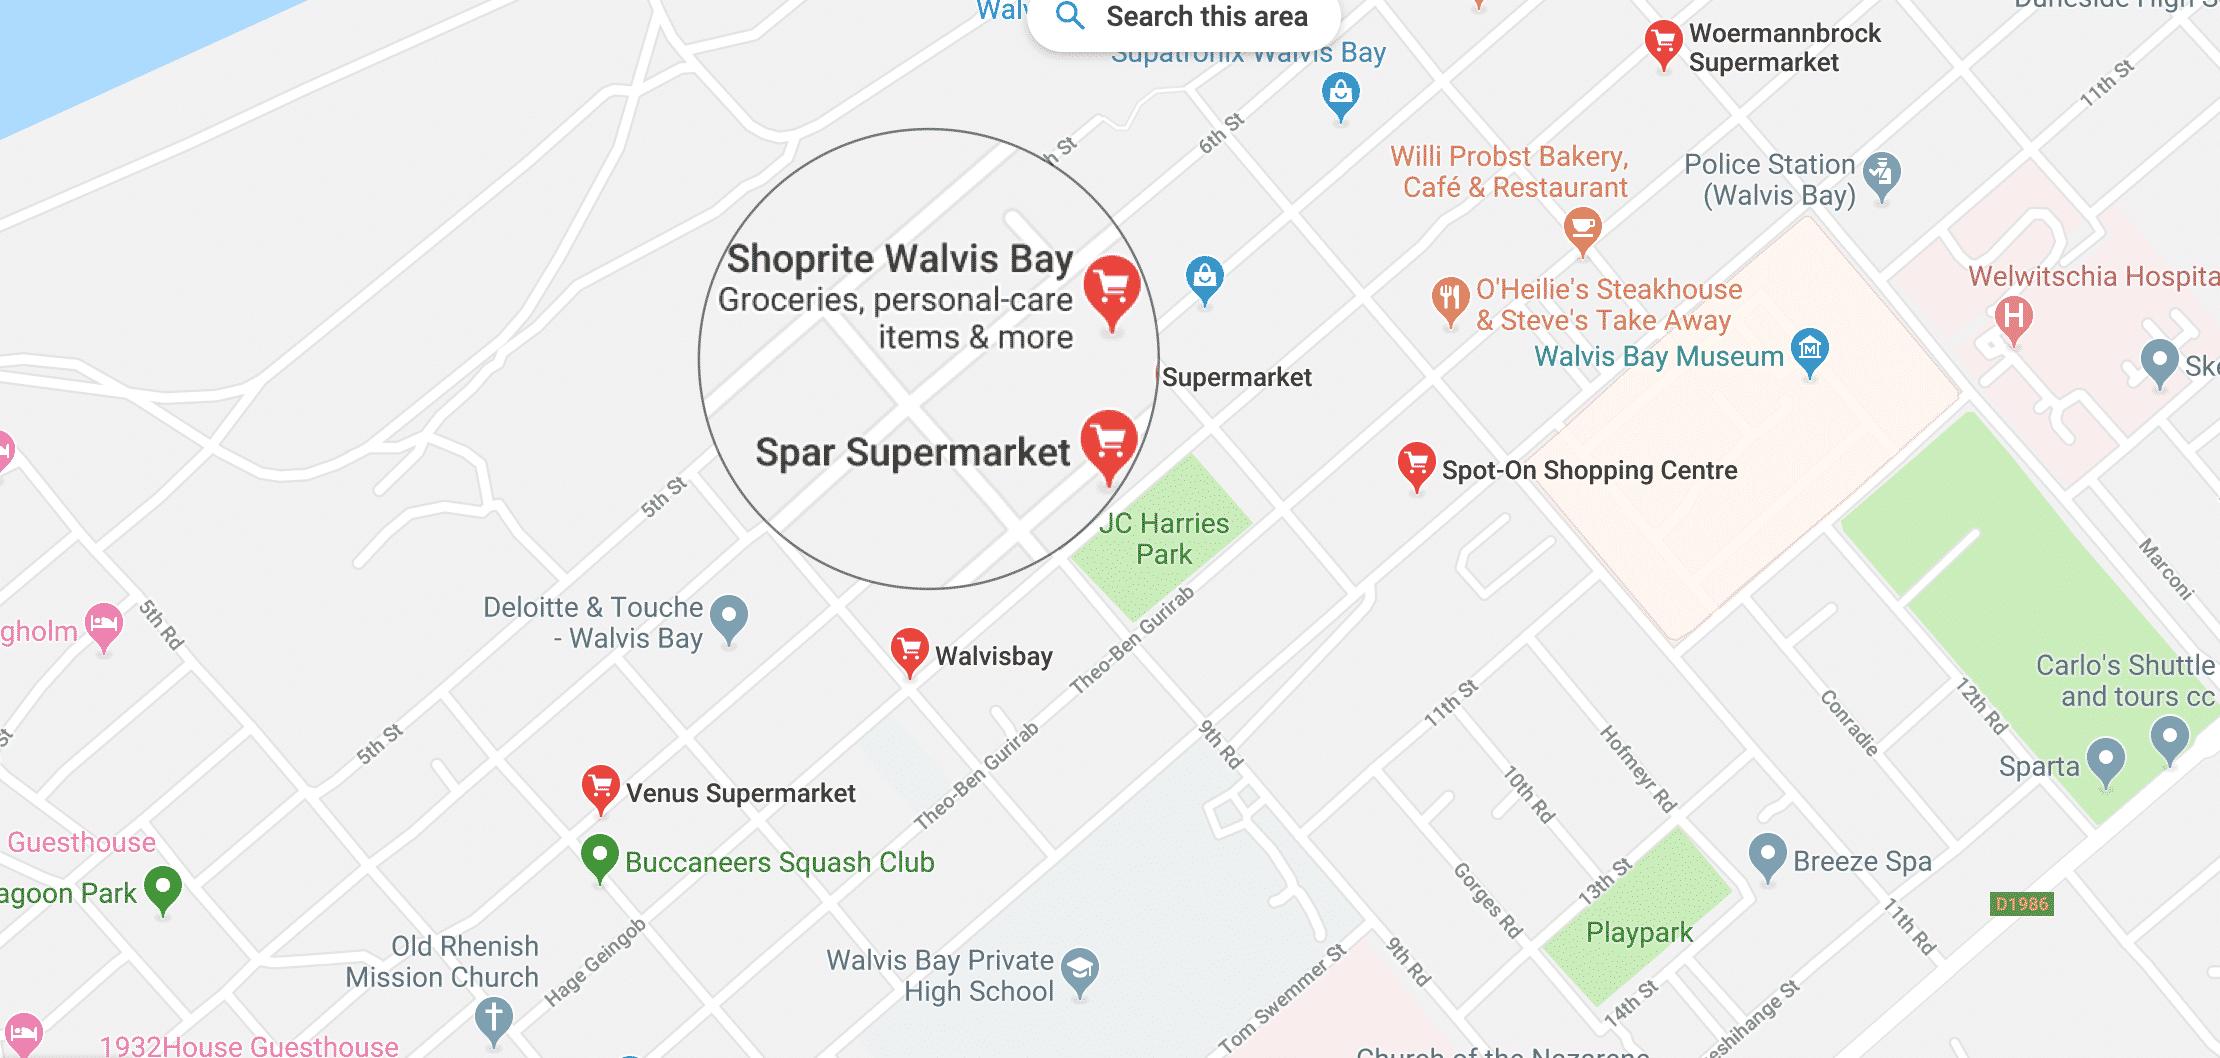 Supermarkets in Walvis Bay